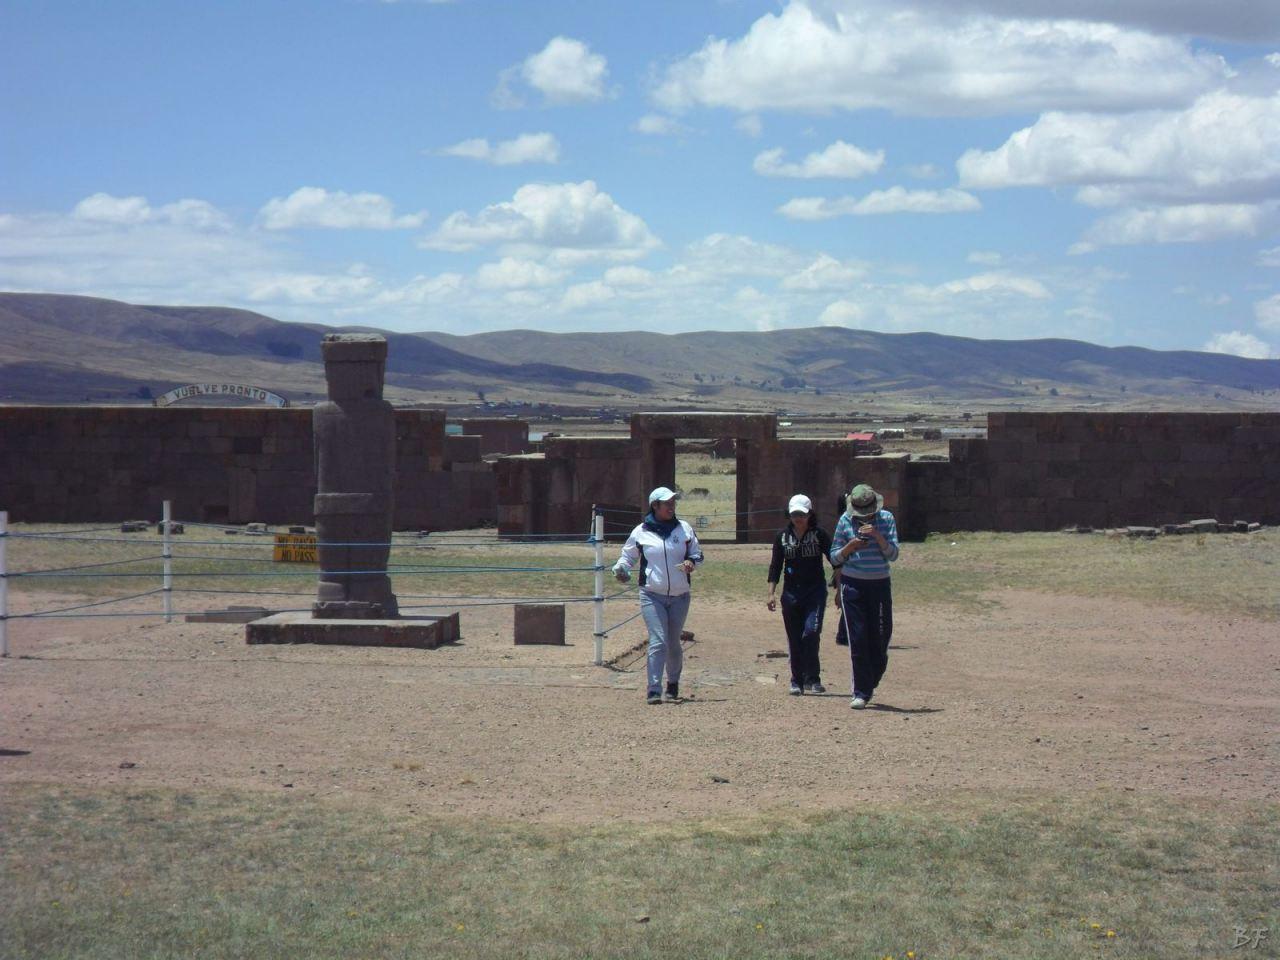 Sito-Megalitico-Piramide-Akapana-Kalasasaya-Menhir-Tiahuanaco-Bolivia-44